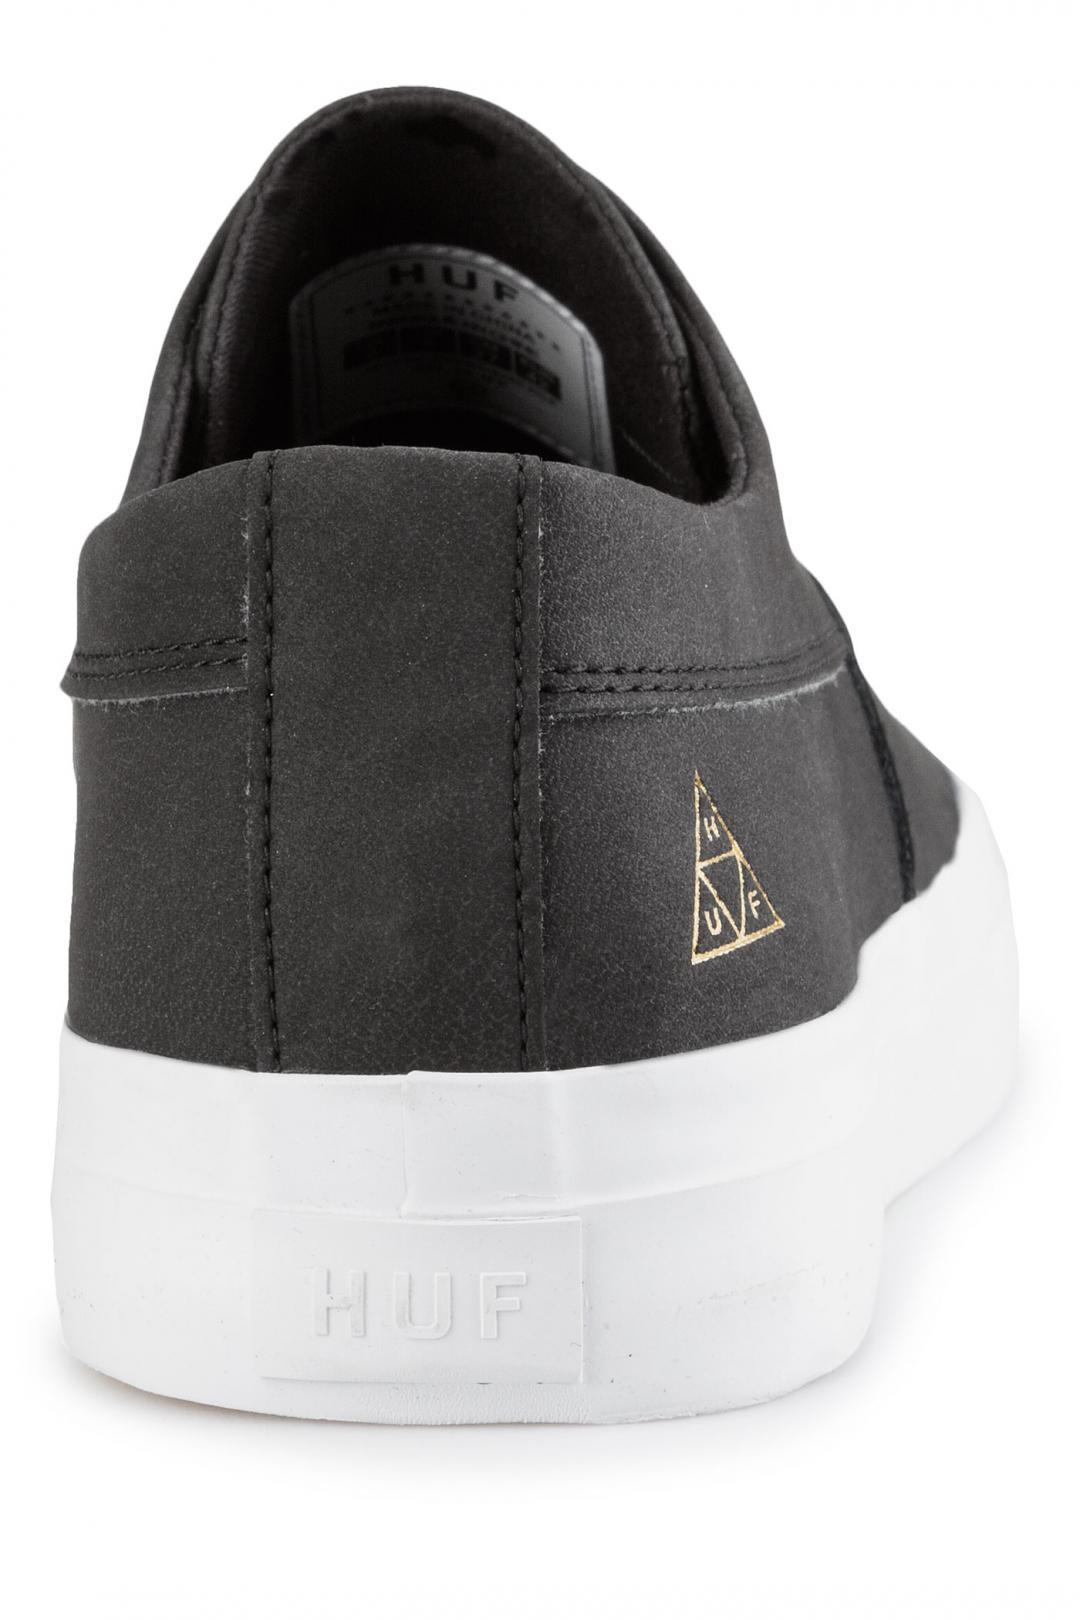 Uomo HUF Dylan Slip On Leather black   Sneakers slip on